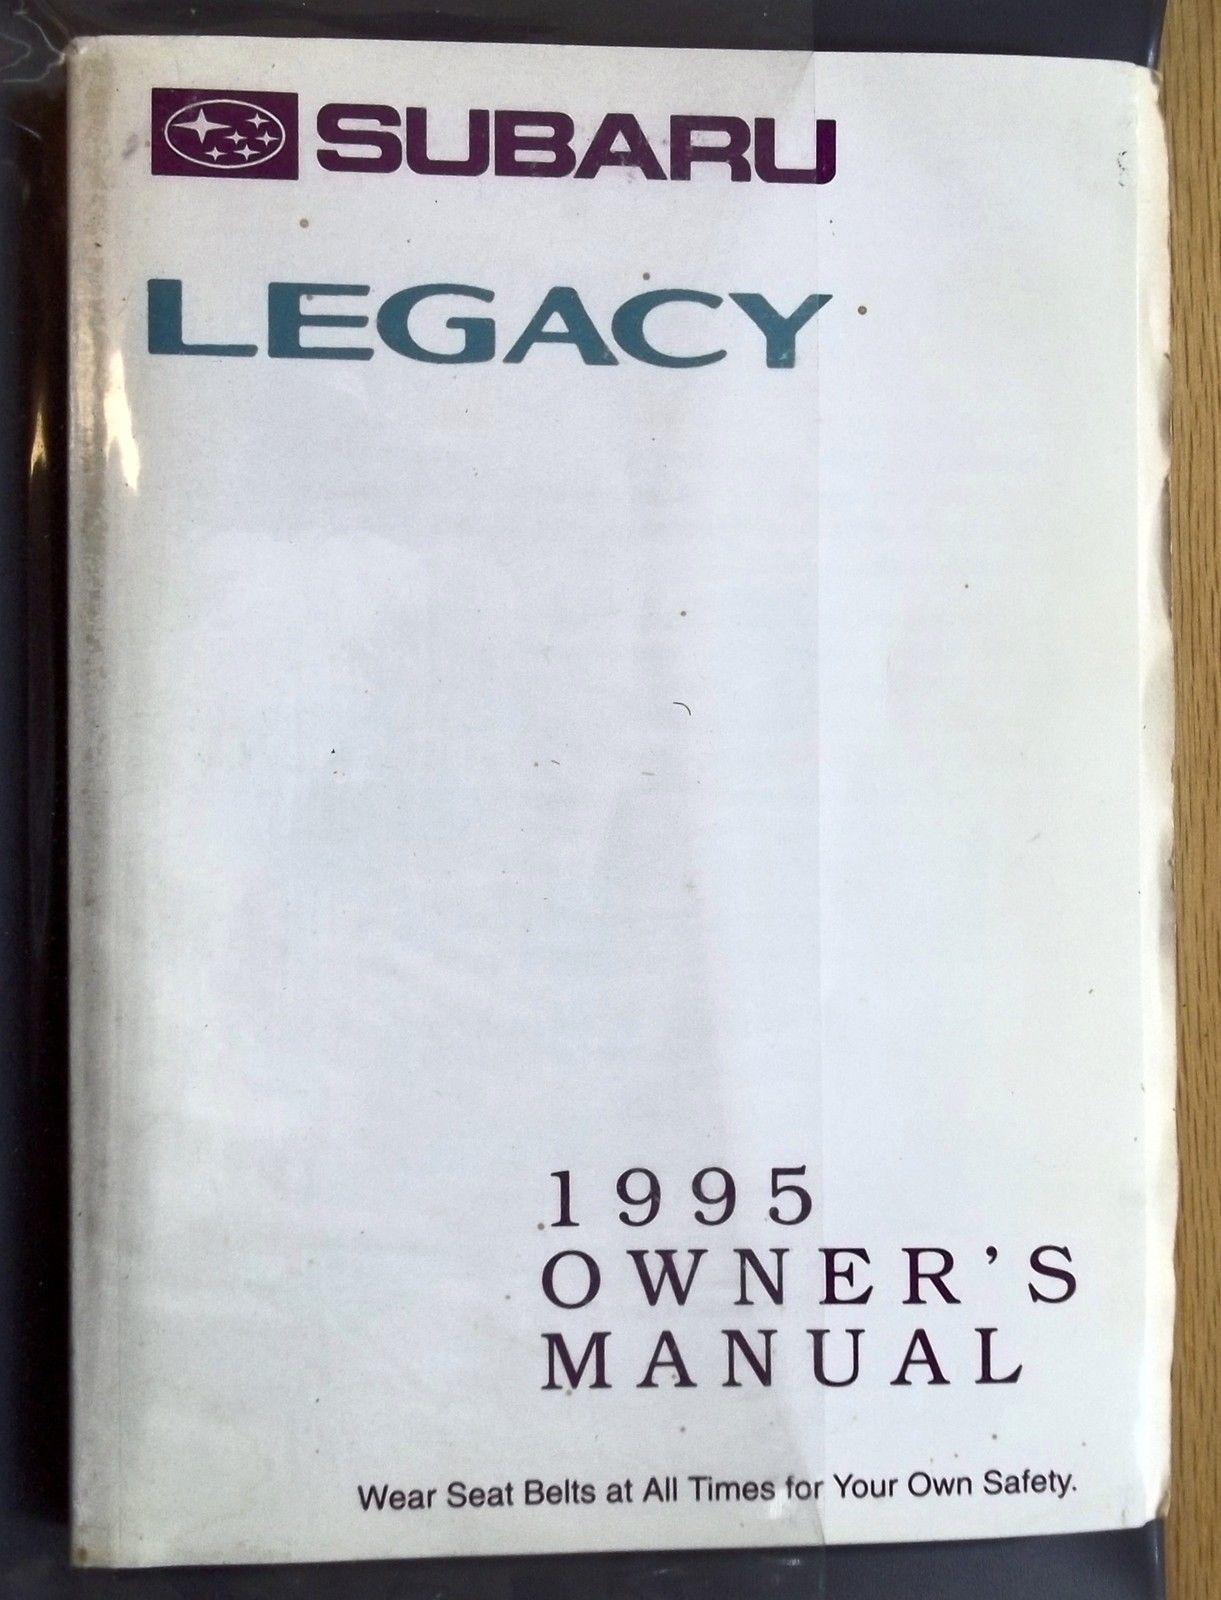 Subaru Legacy Car Auto Automobile Drivers Owners Manual 1995